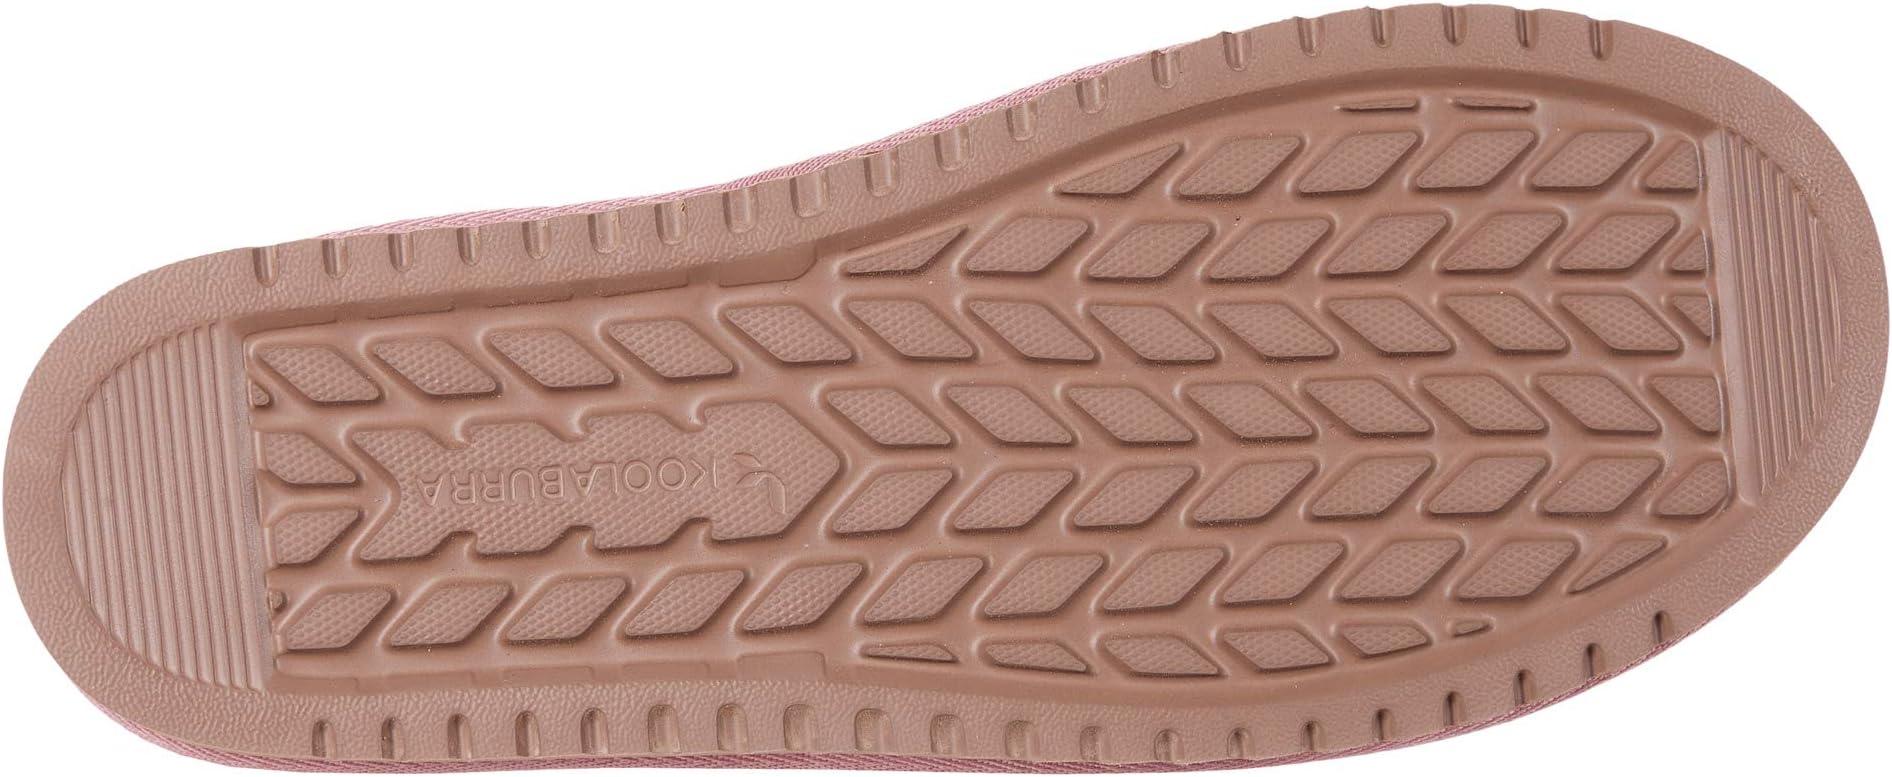 Koolaburra by UGG Victoria Short | Women's shoes | 2020 Newest